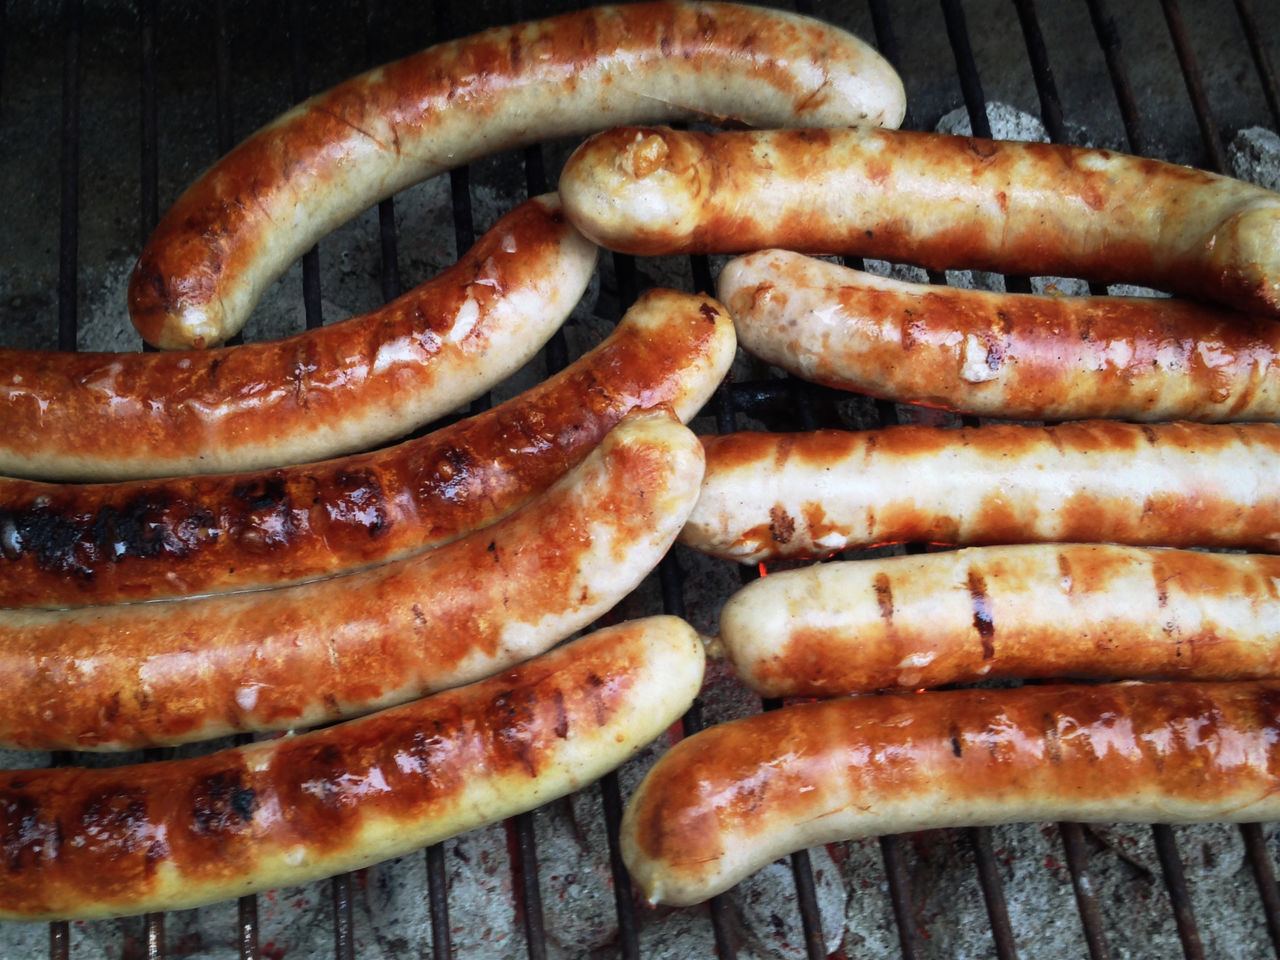 Just now - Grillen im Schnee - Thüringer Bratwurst geht immer ? Germany My Fuckin Berlin Berlin Tadaa Community Hello World Thüringer Bratwurst EyeEm Bestsellers